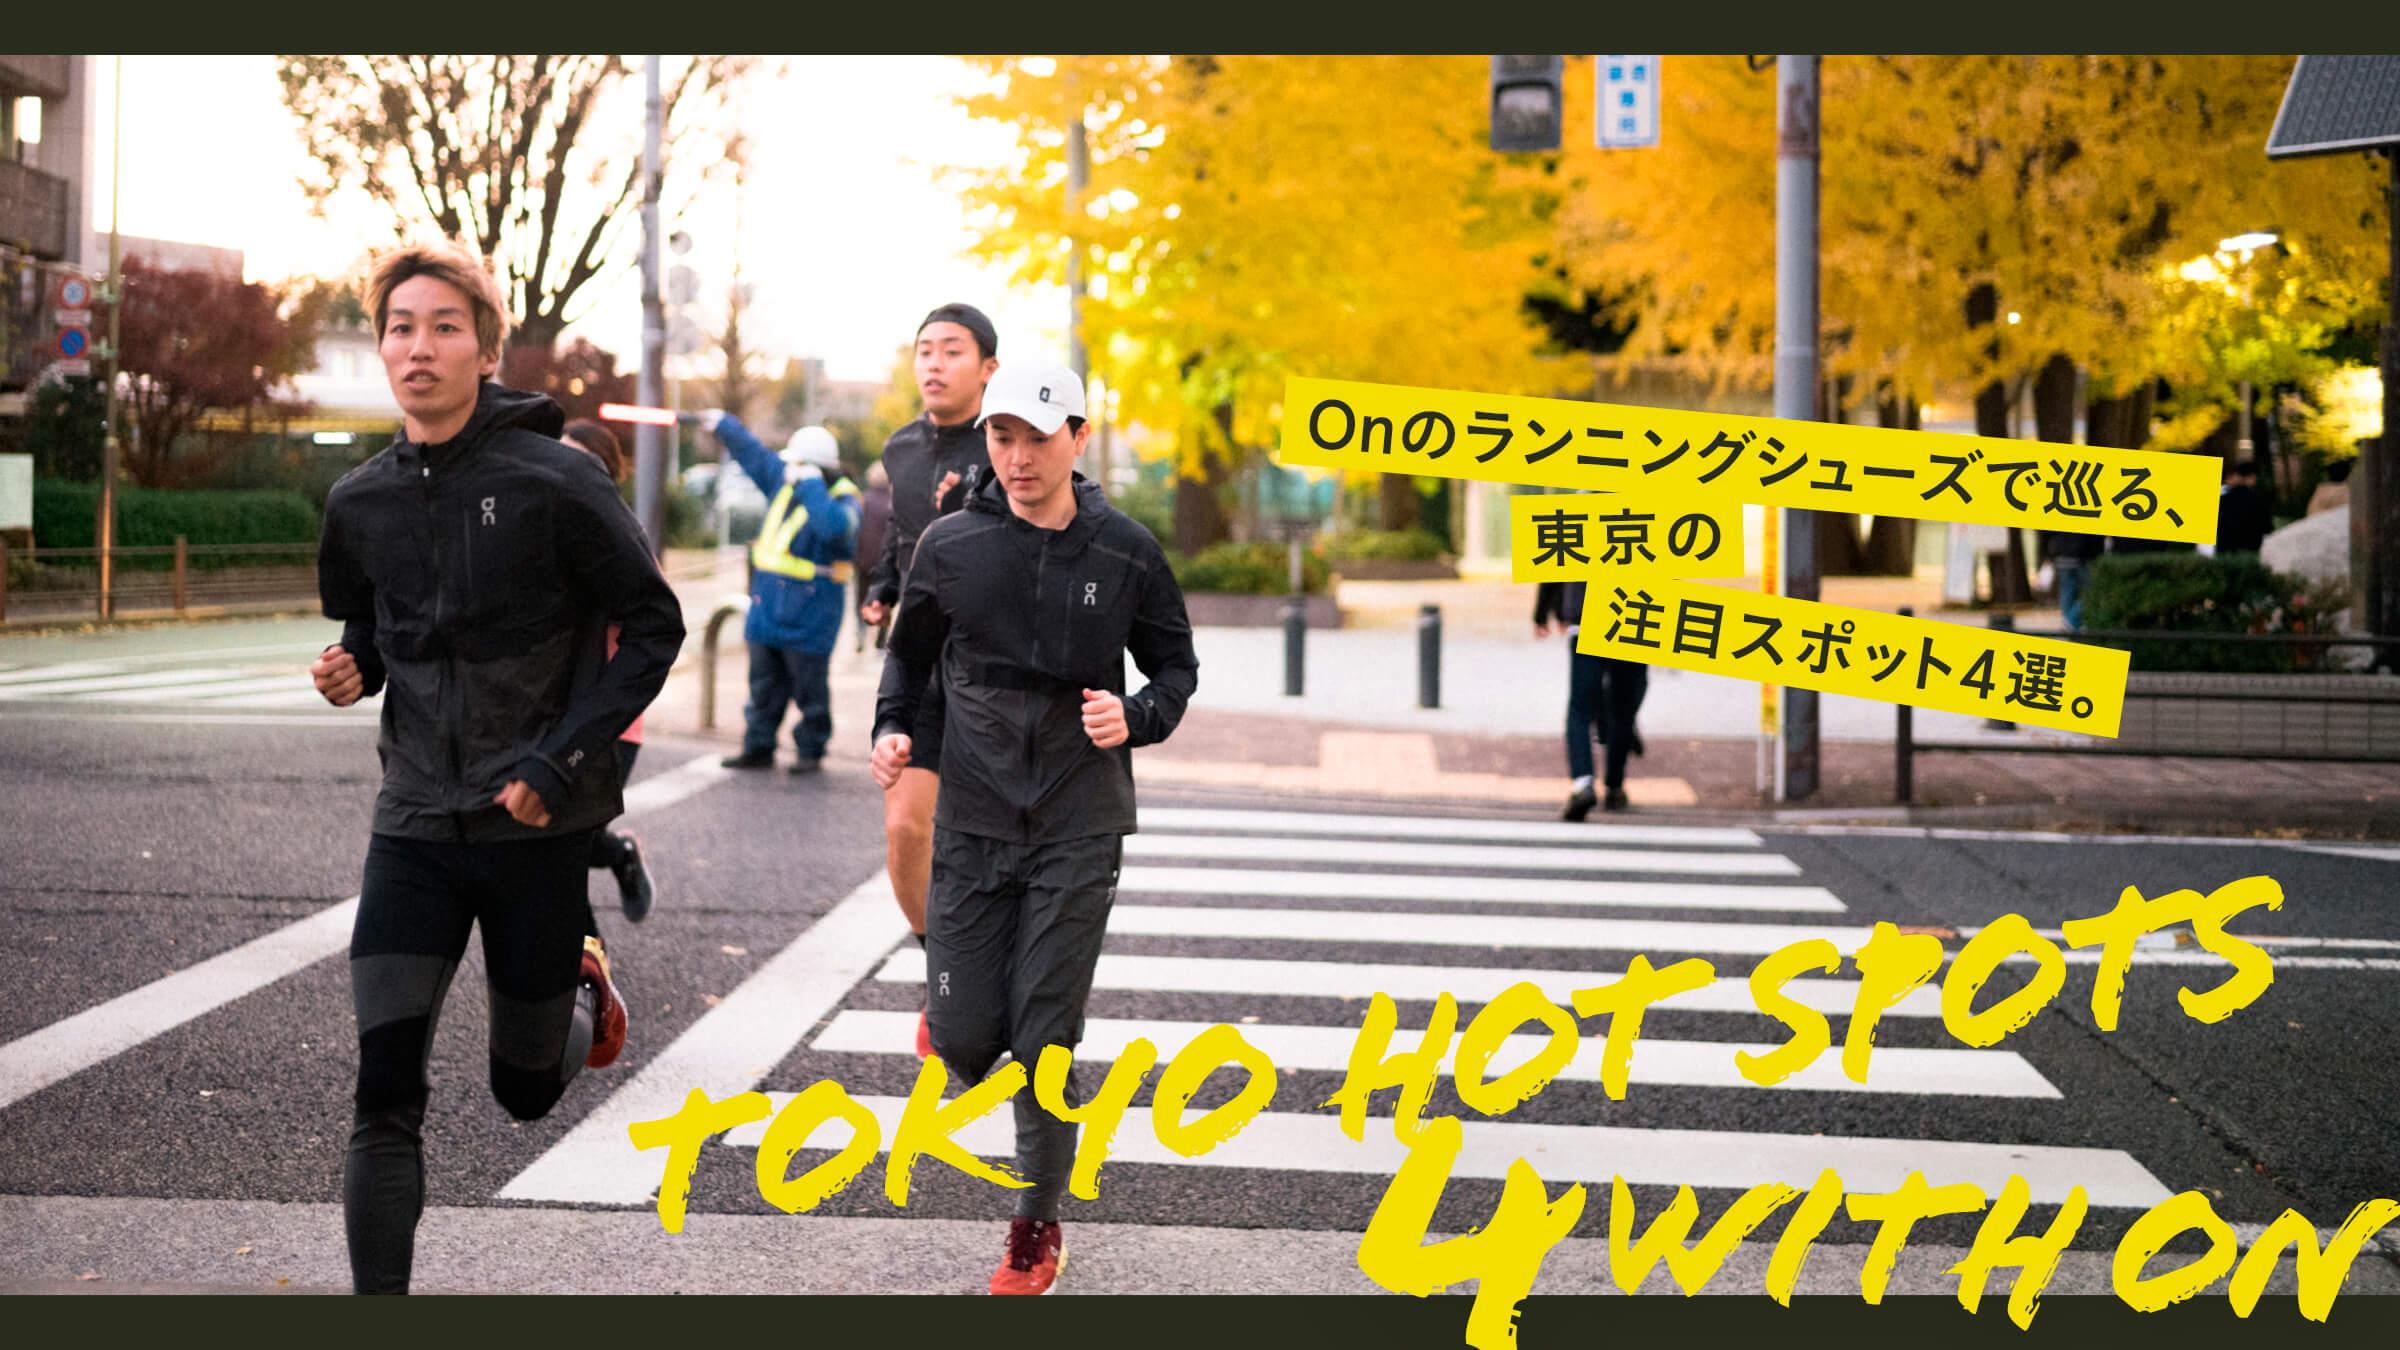 Onのランニングシューズで巡る、東京の注目スポット4選。